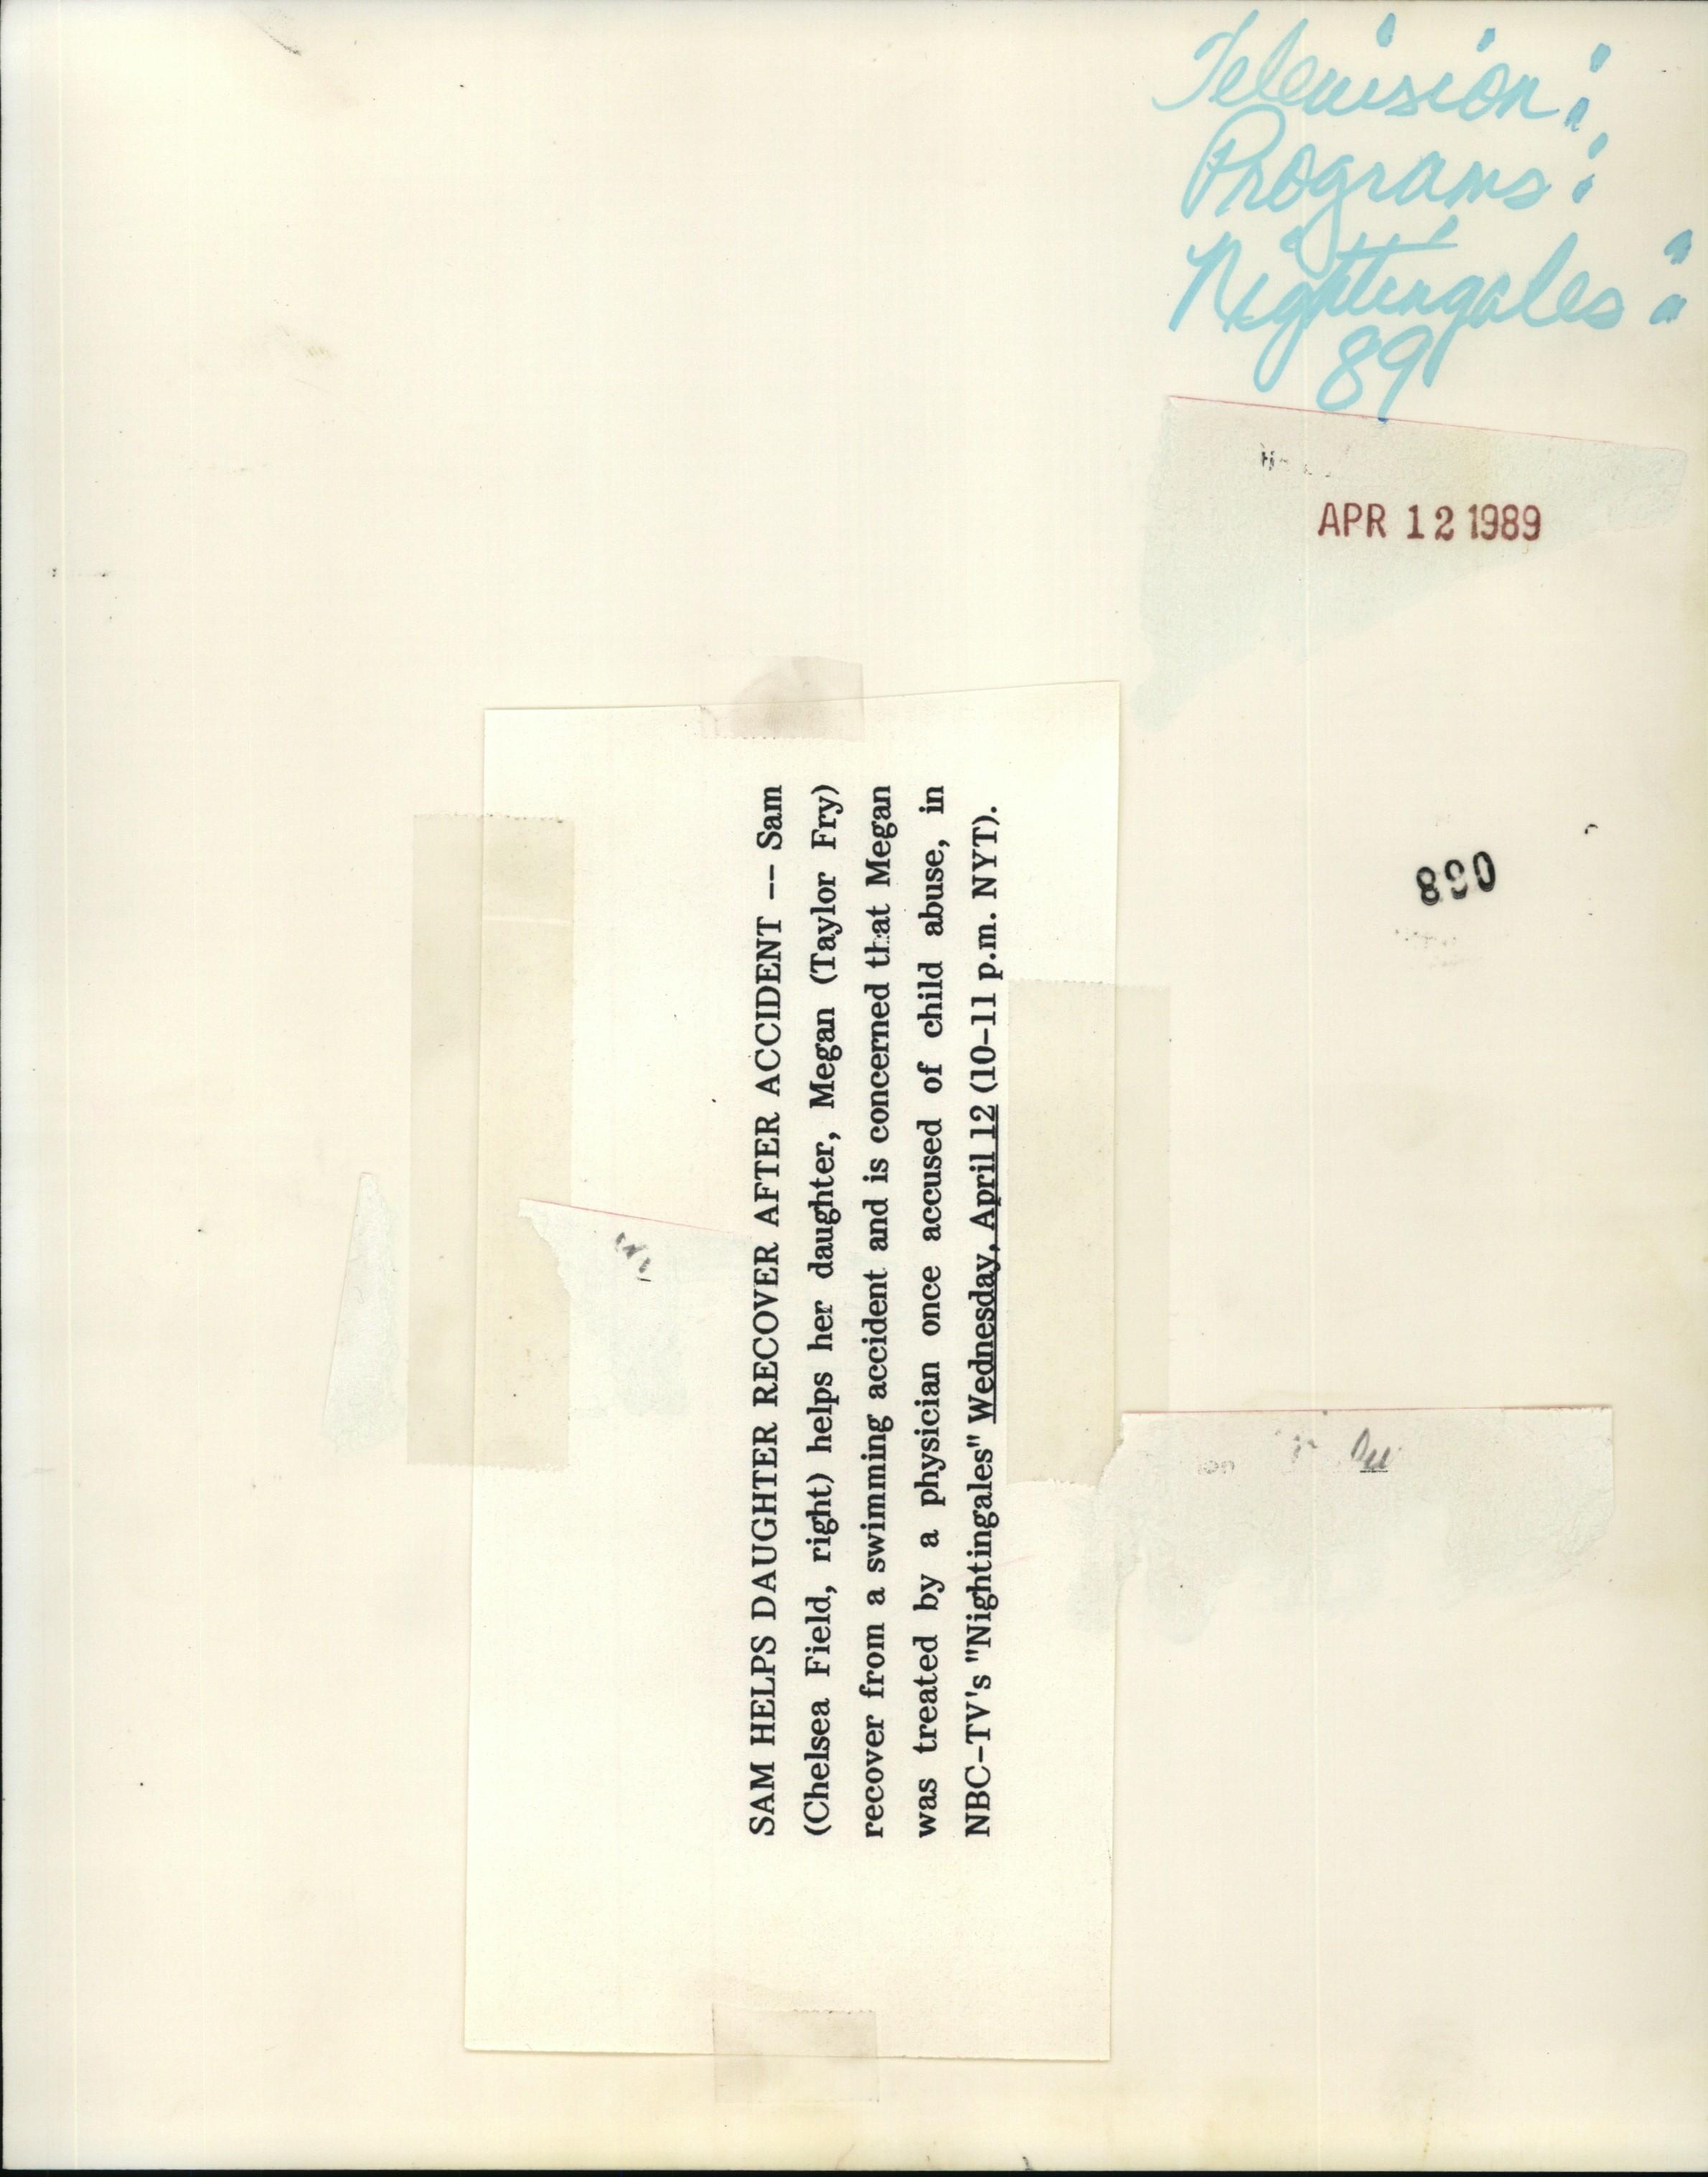 Bhreagh MacNeil,Noelle Freeman Porn tube Tetchie Agbayani (b. 1961),Robin Weisman